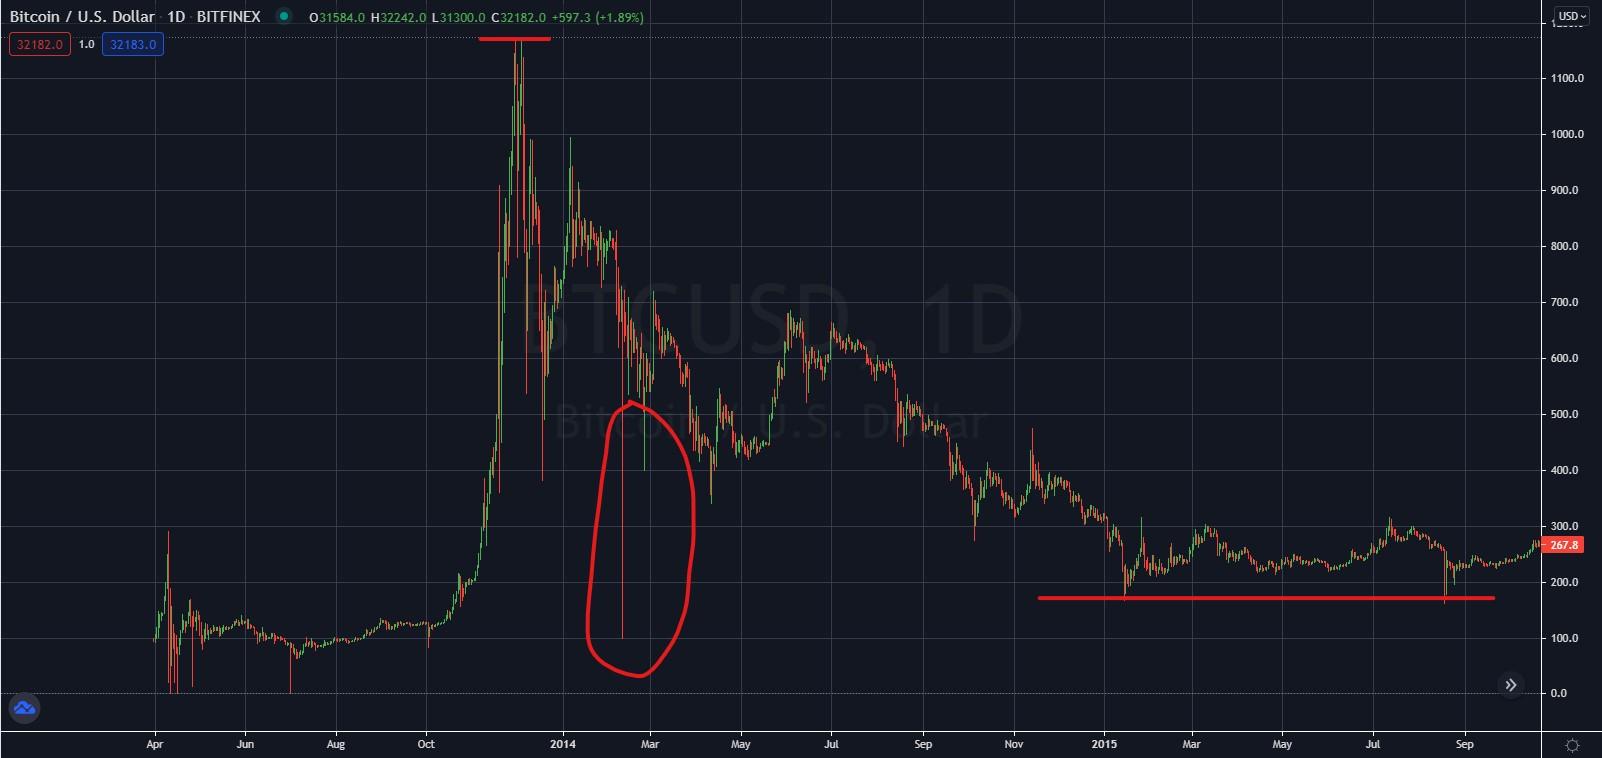 Bitcoin Price 2013-2015